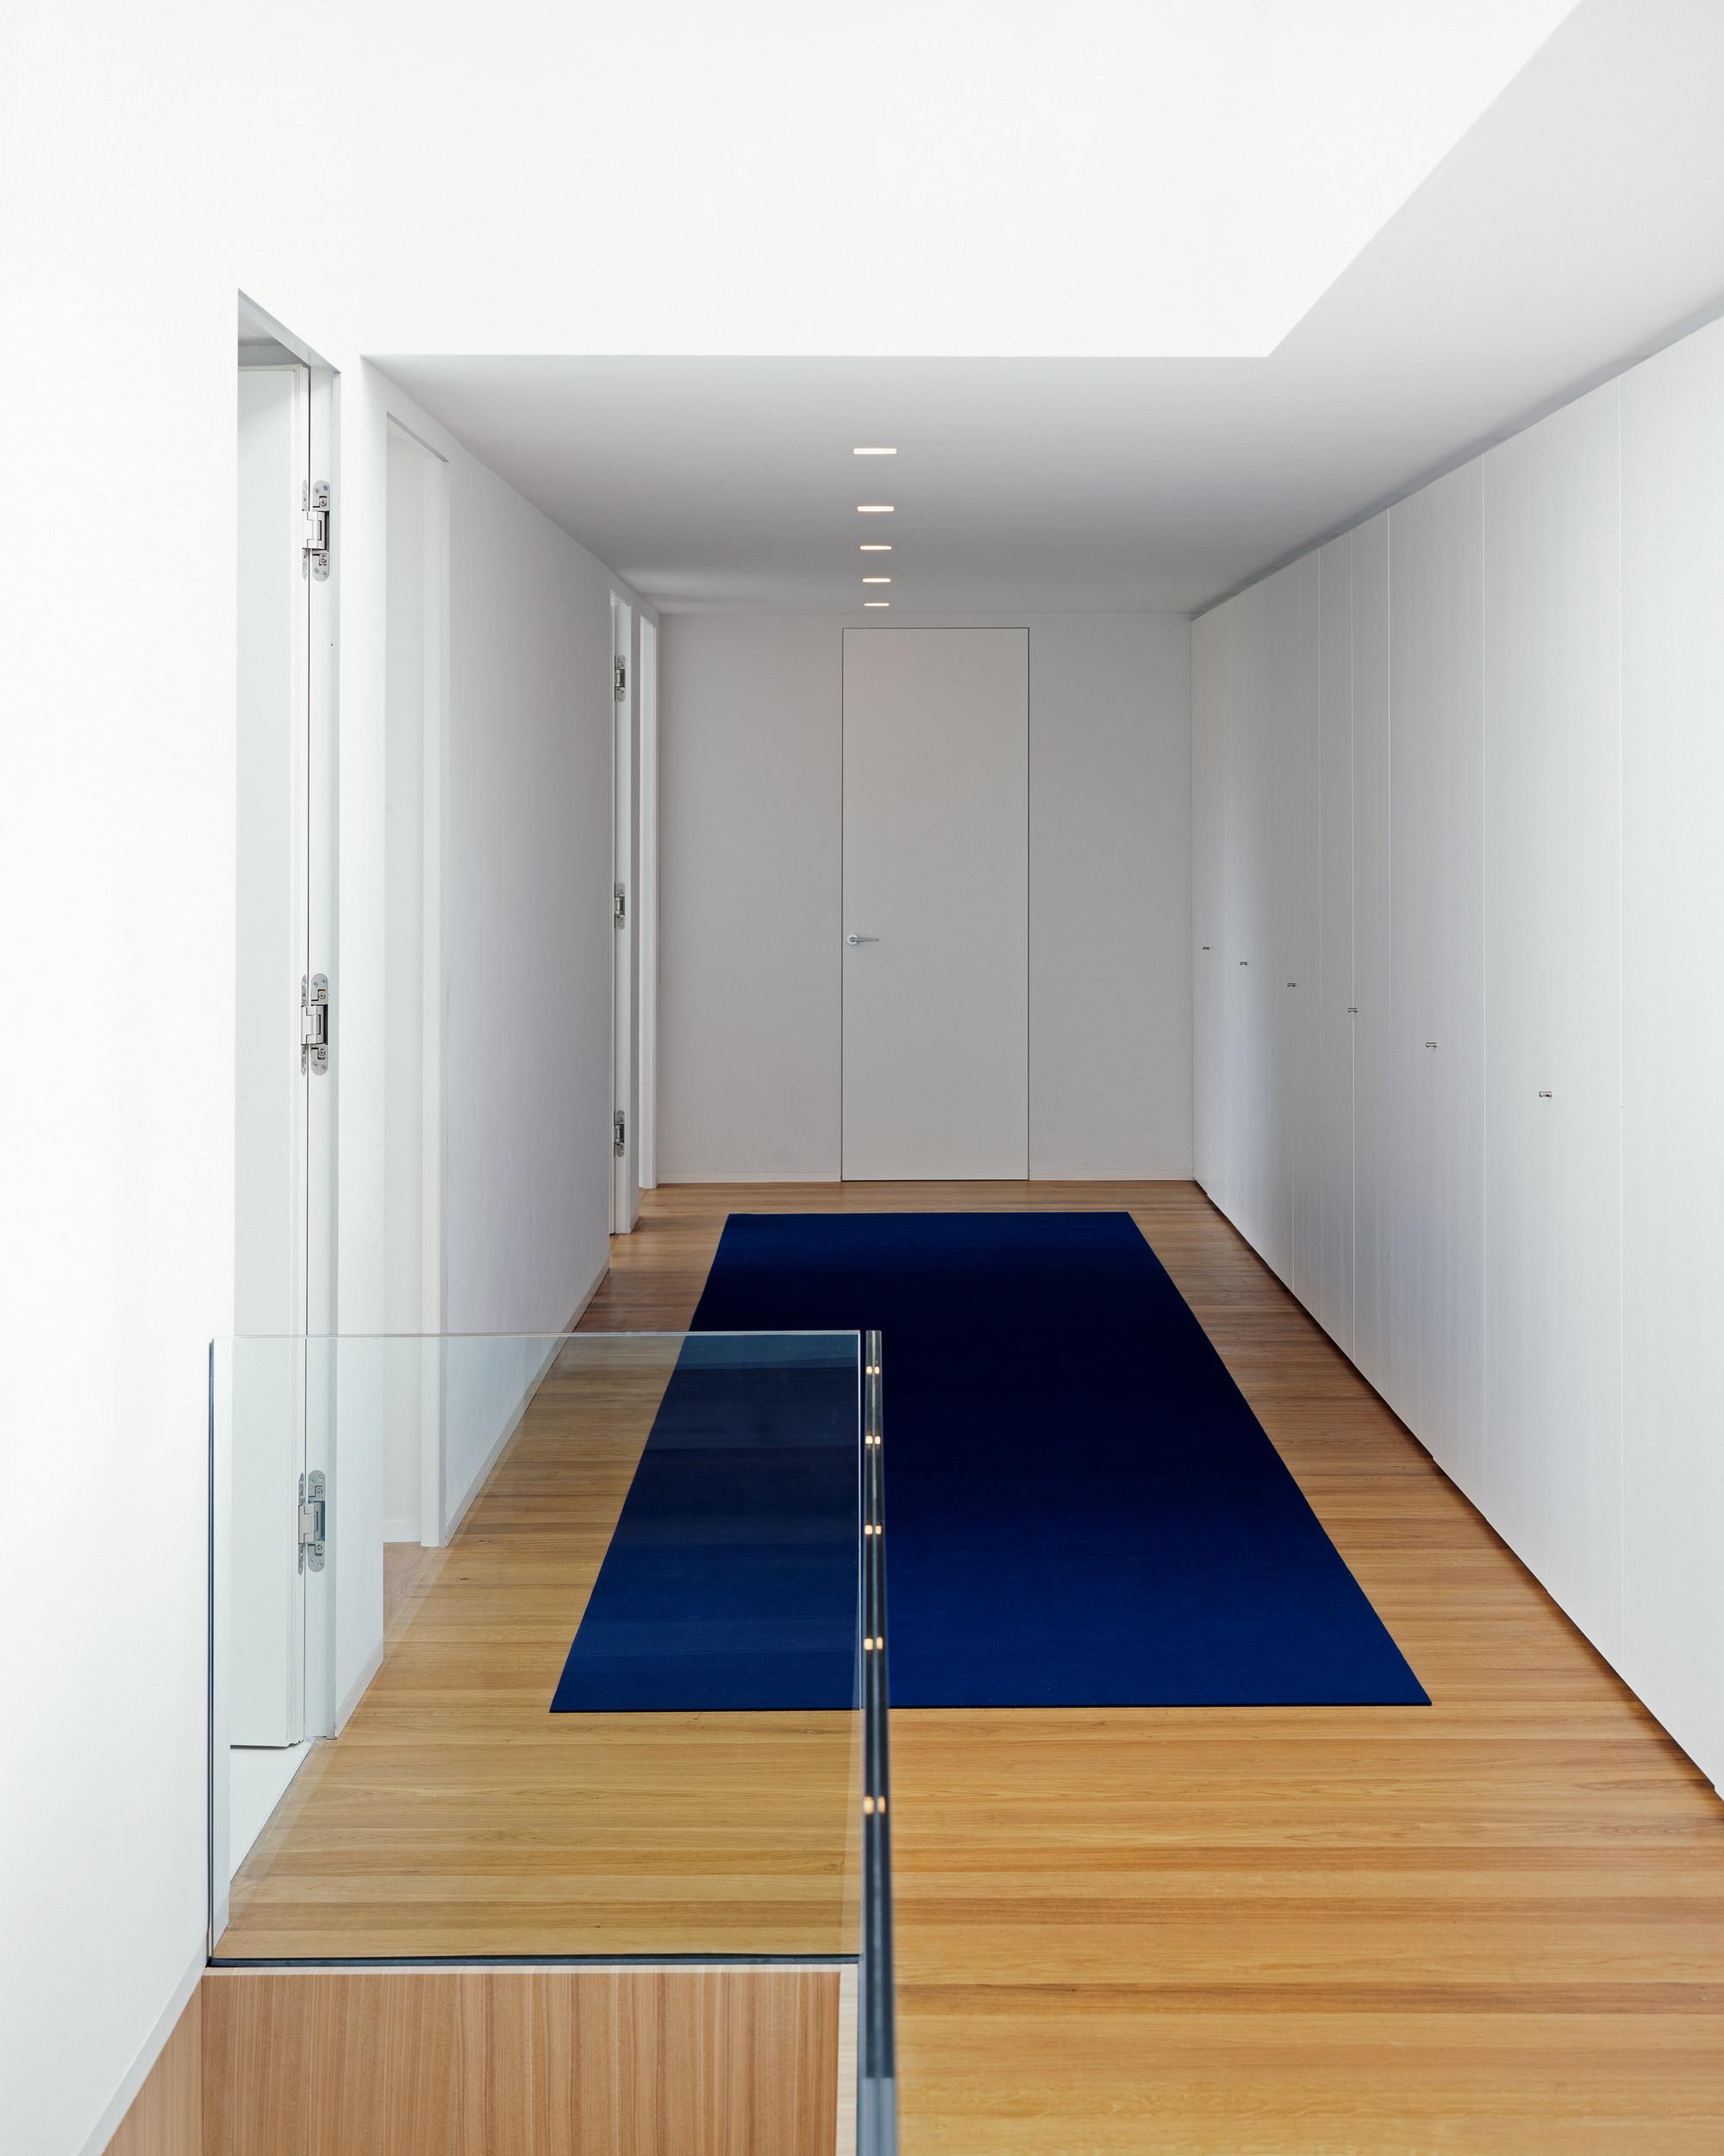 Galeria de casa p philipp architekten 28 - Philipp architekten ...